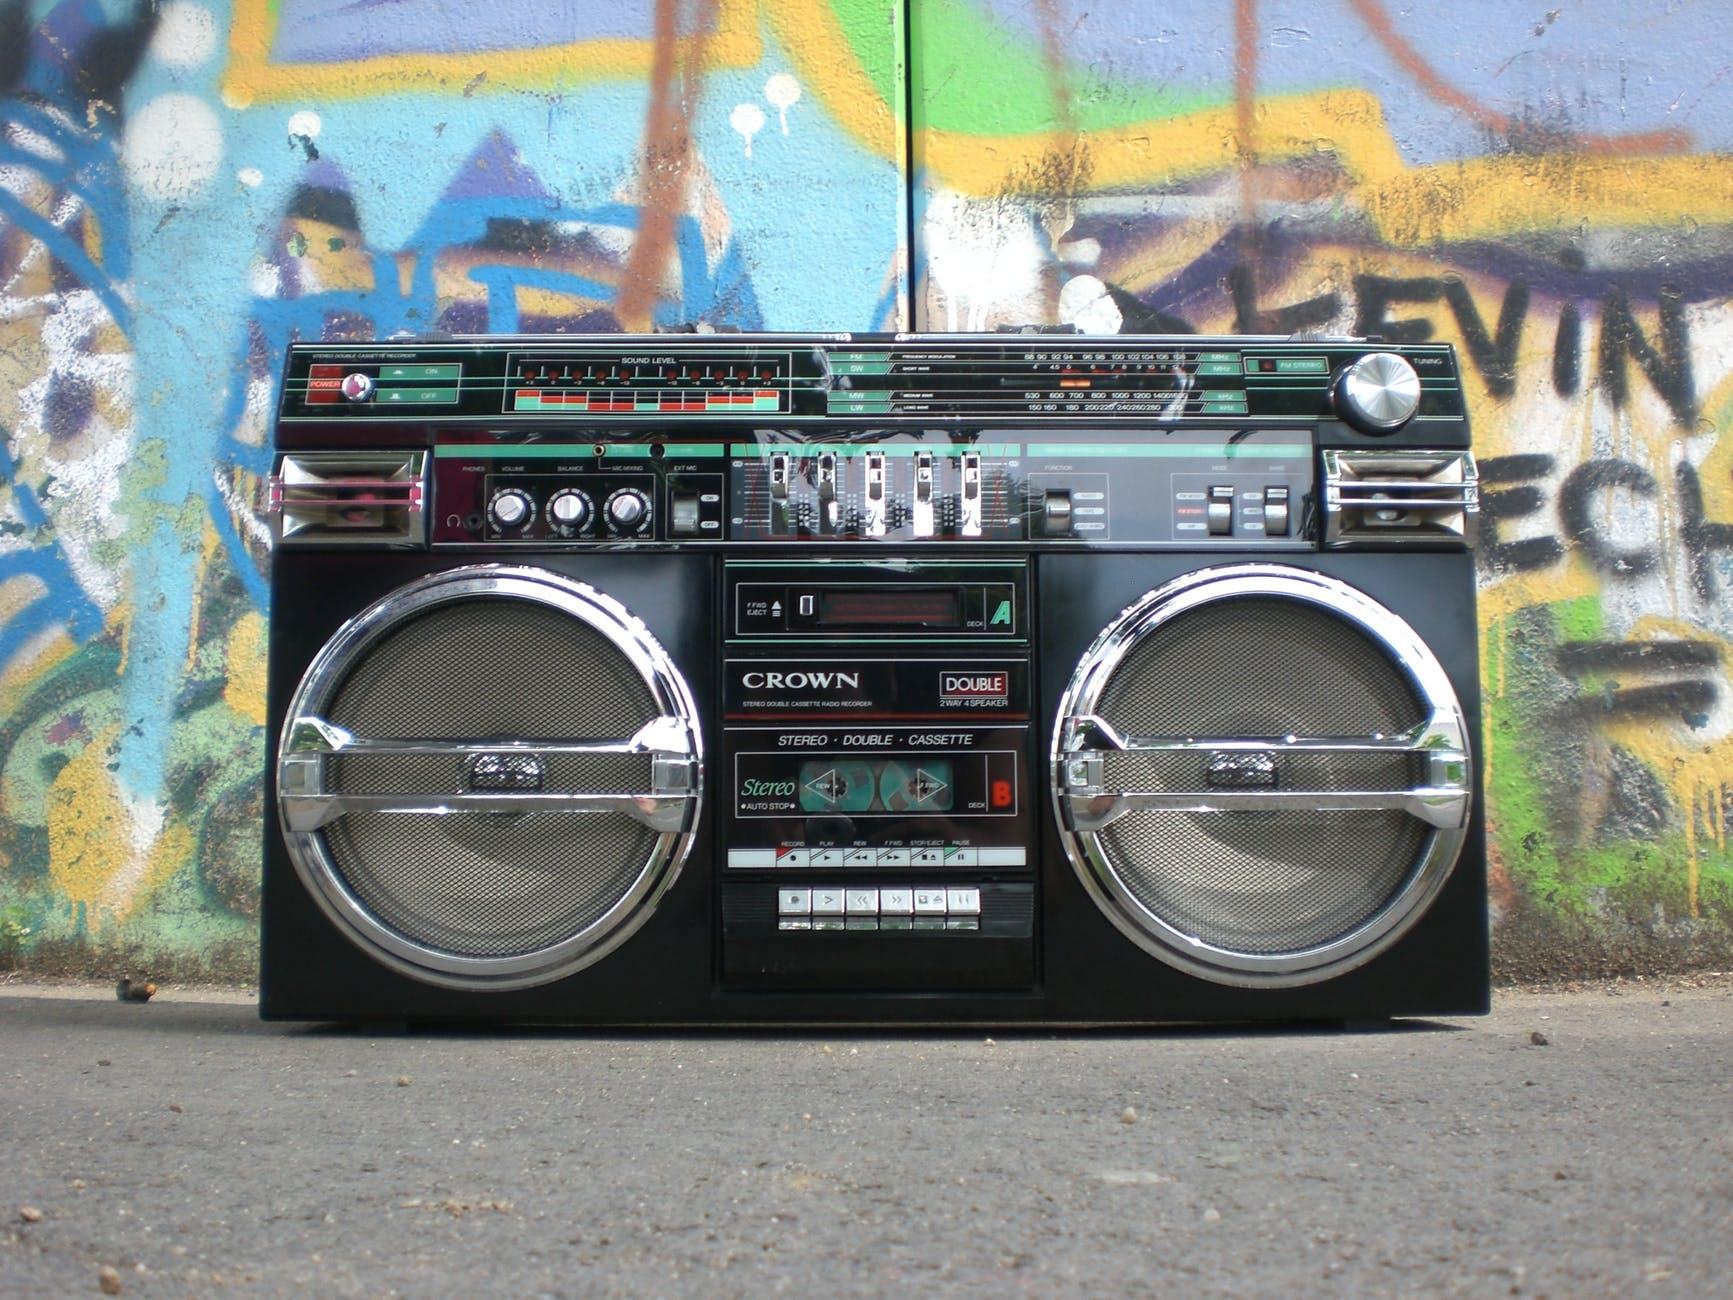 ghettoblaster-radio-recorder-boombox-old-school-159613.jpeg